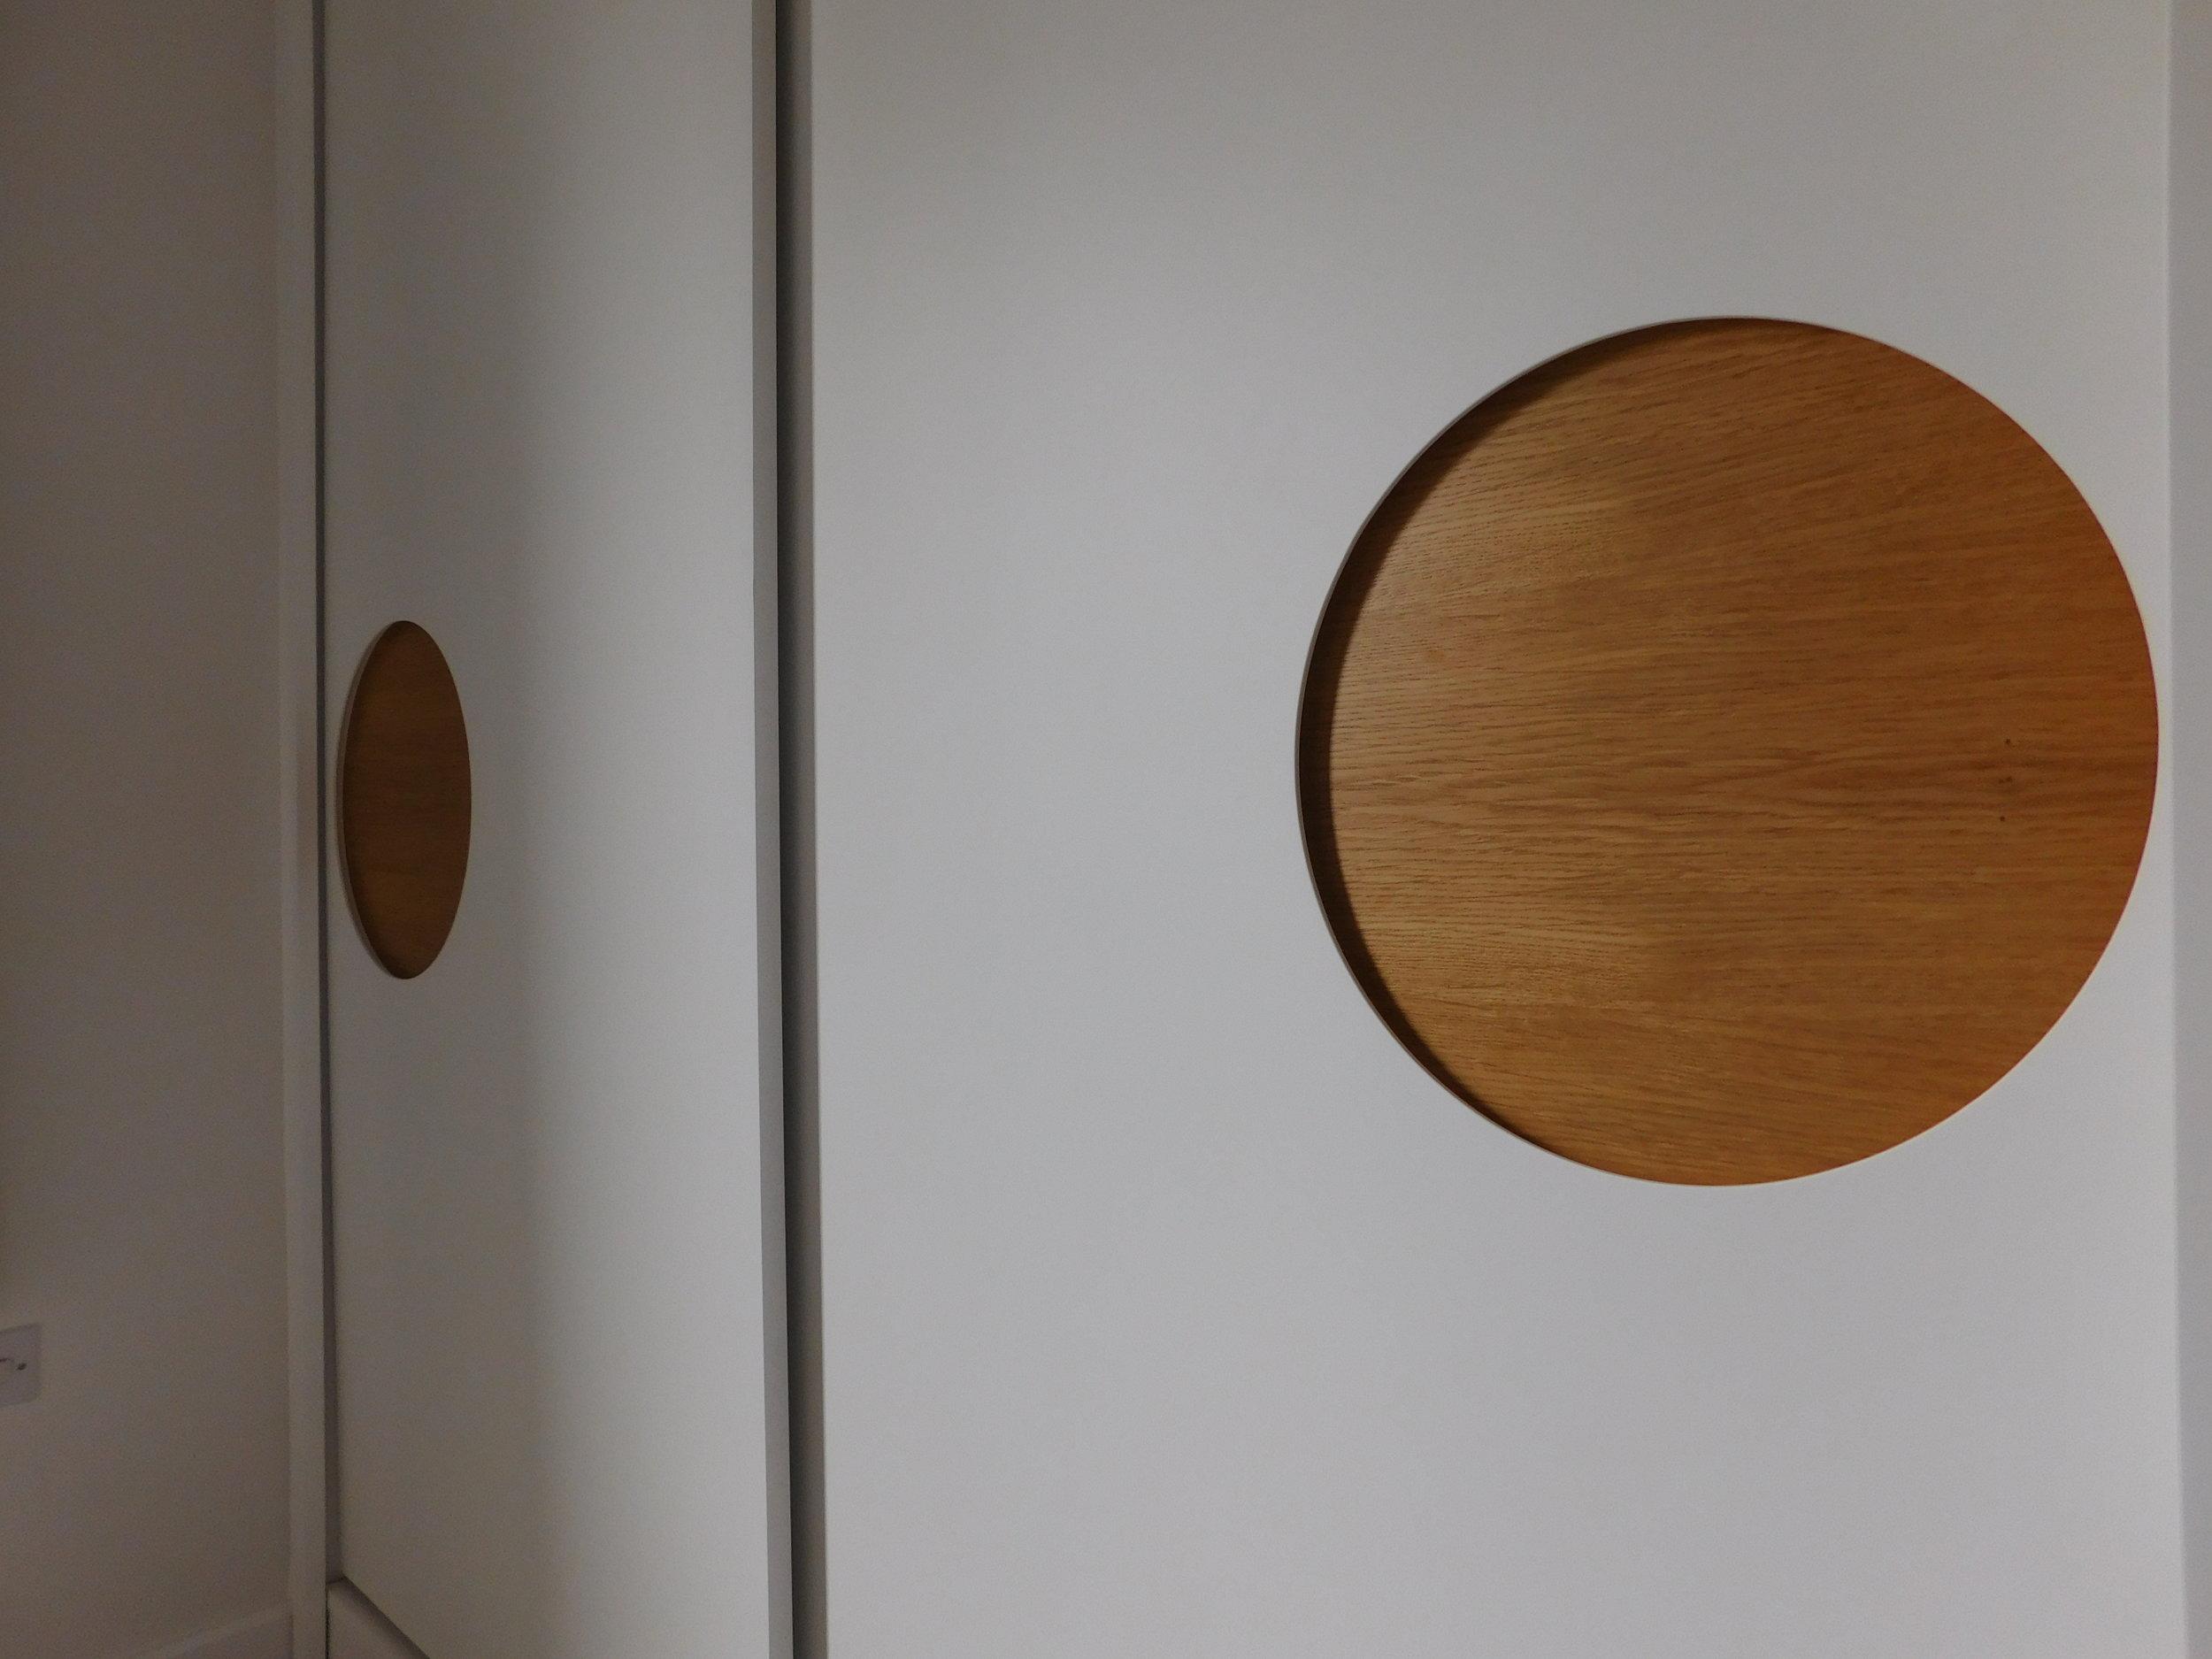 Sliding doors with Oak inset handle panels